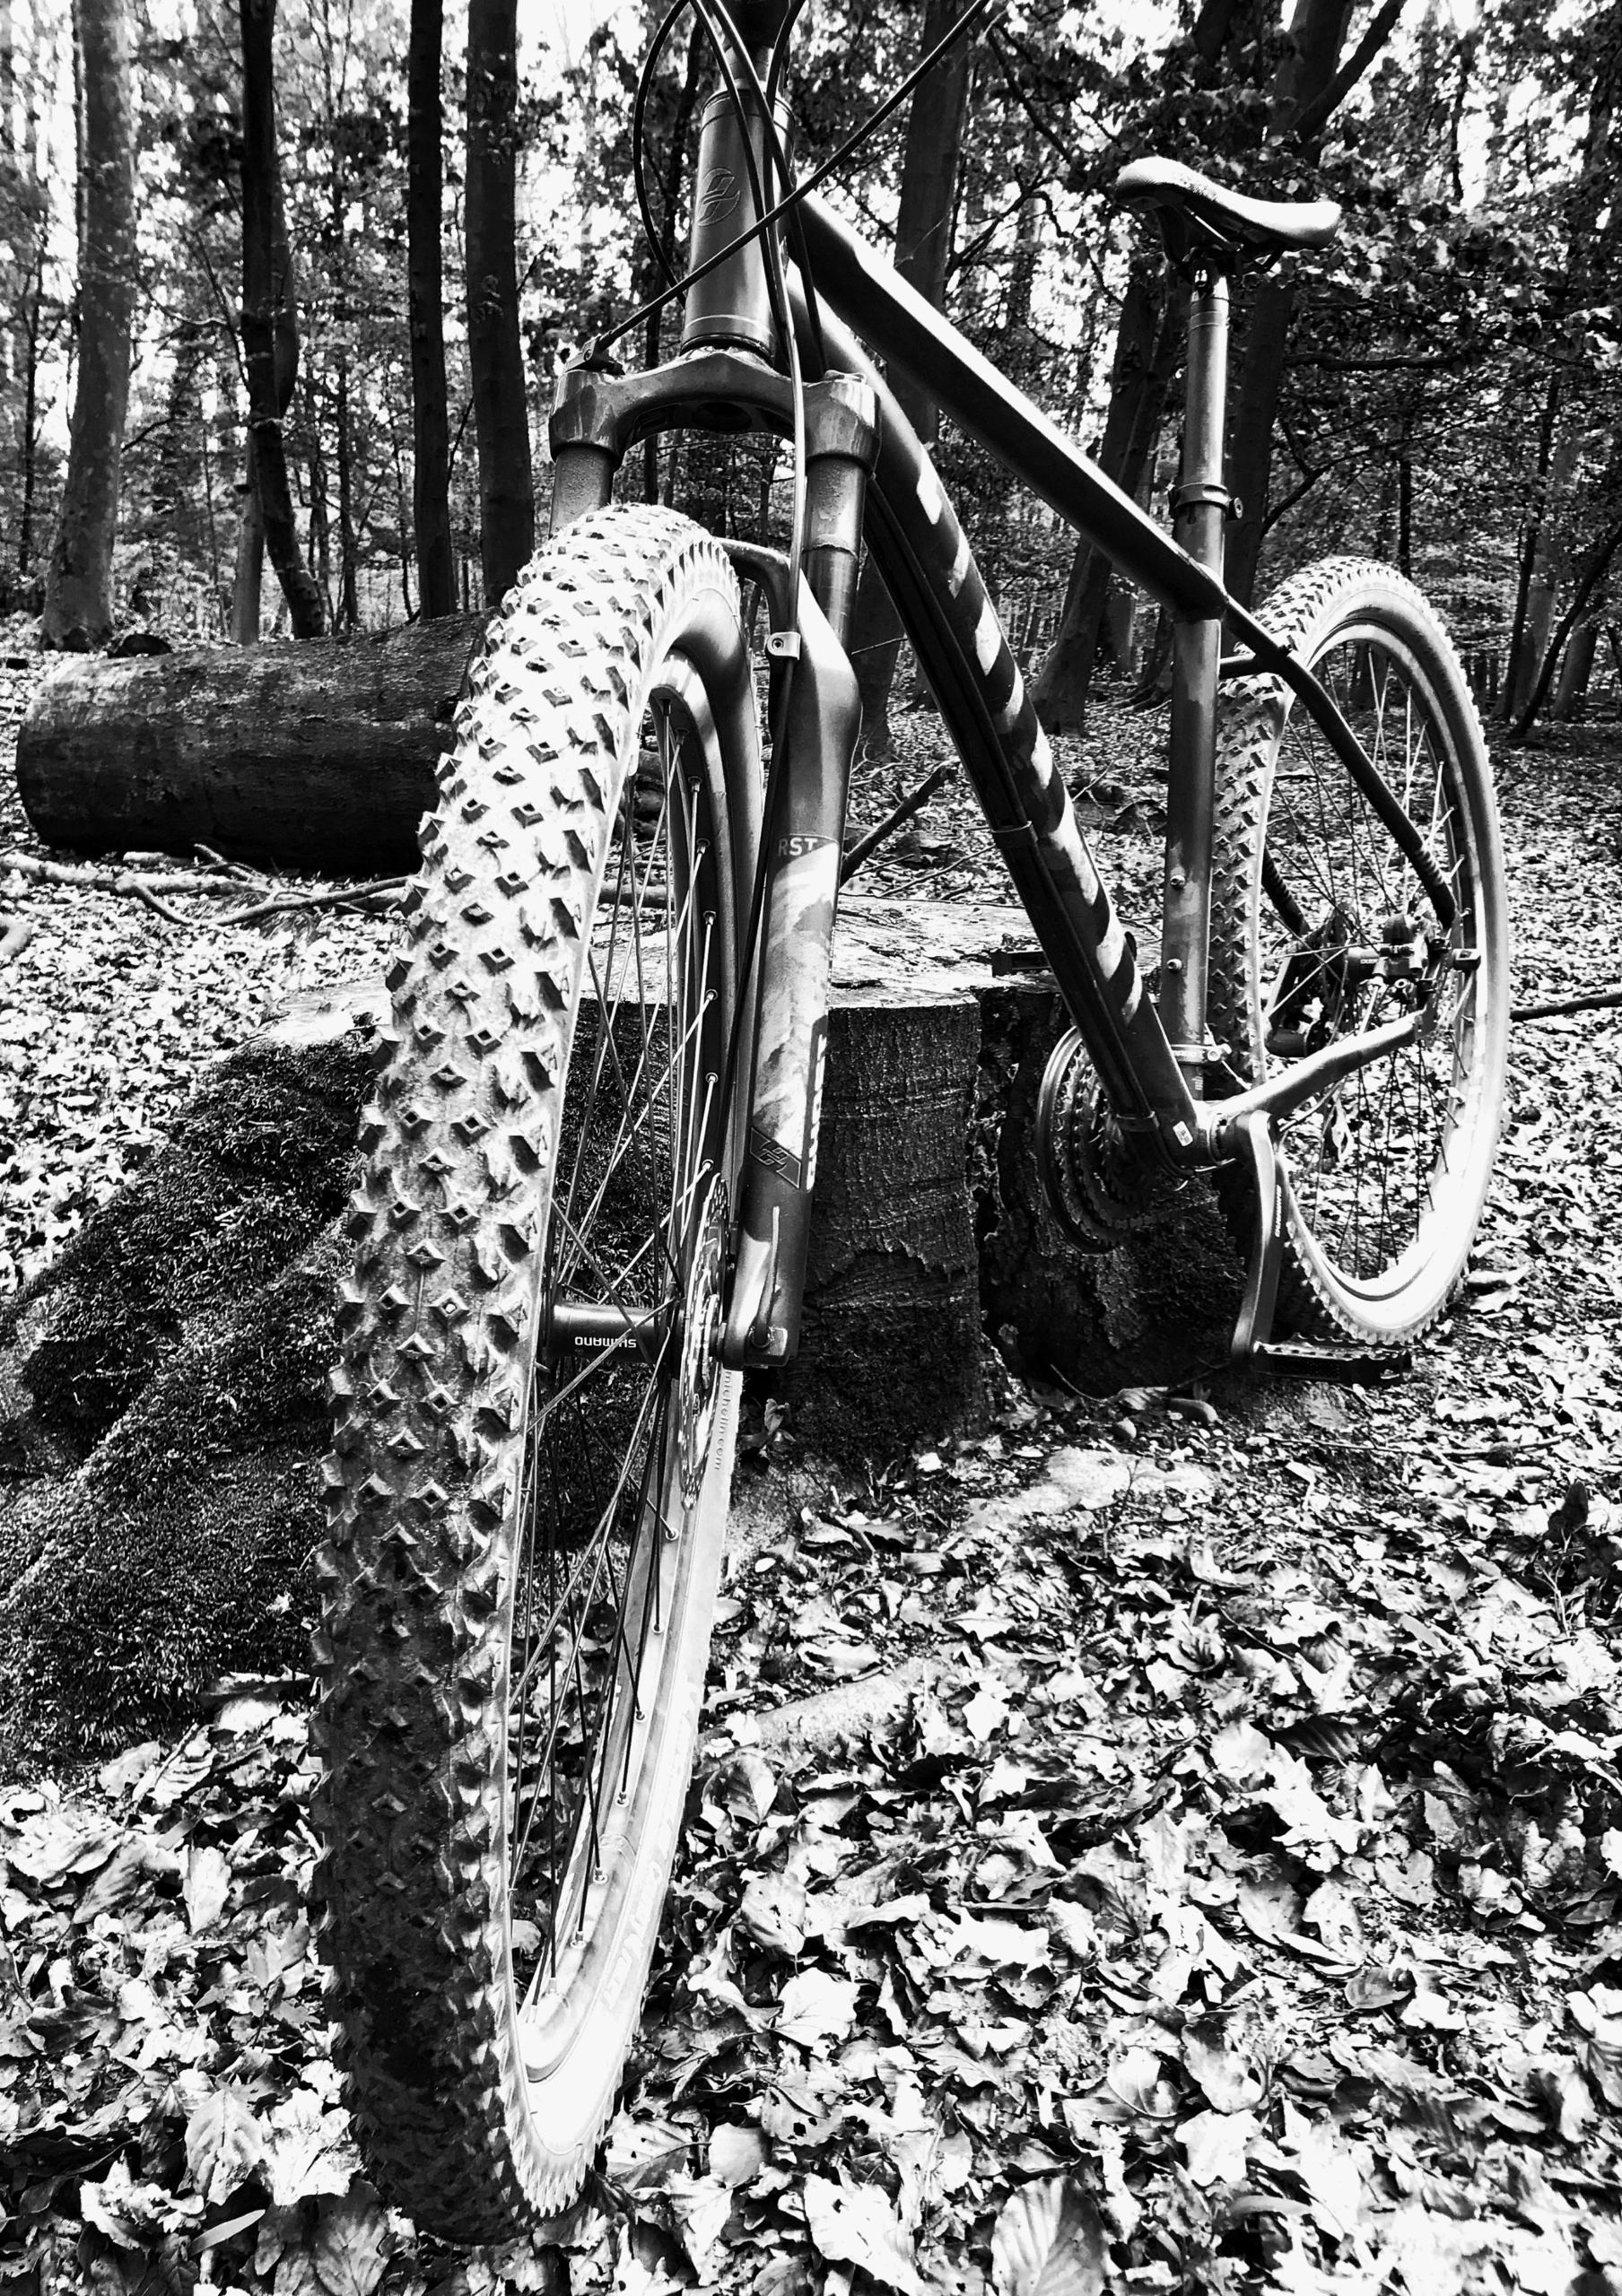 Today nice weather ride bike - blackandwhitephotography - borisholtz | ello